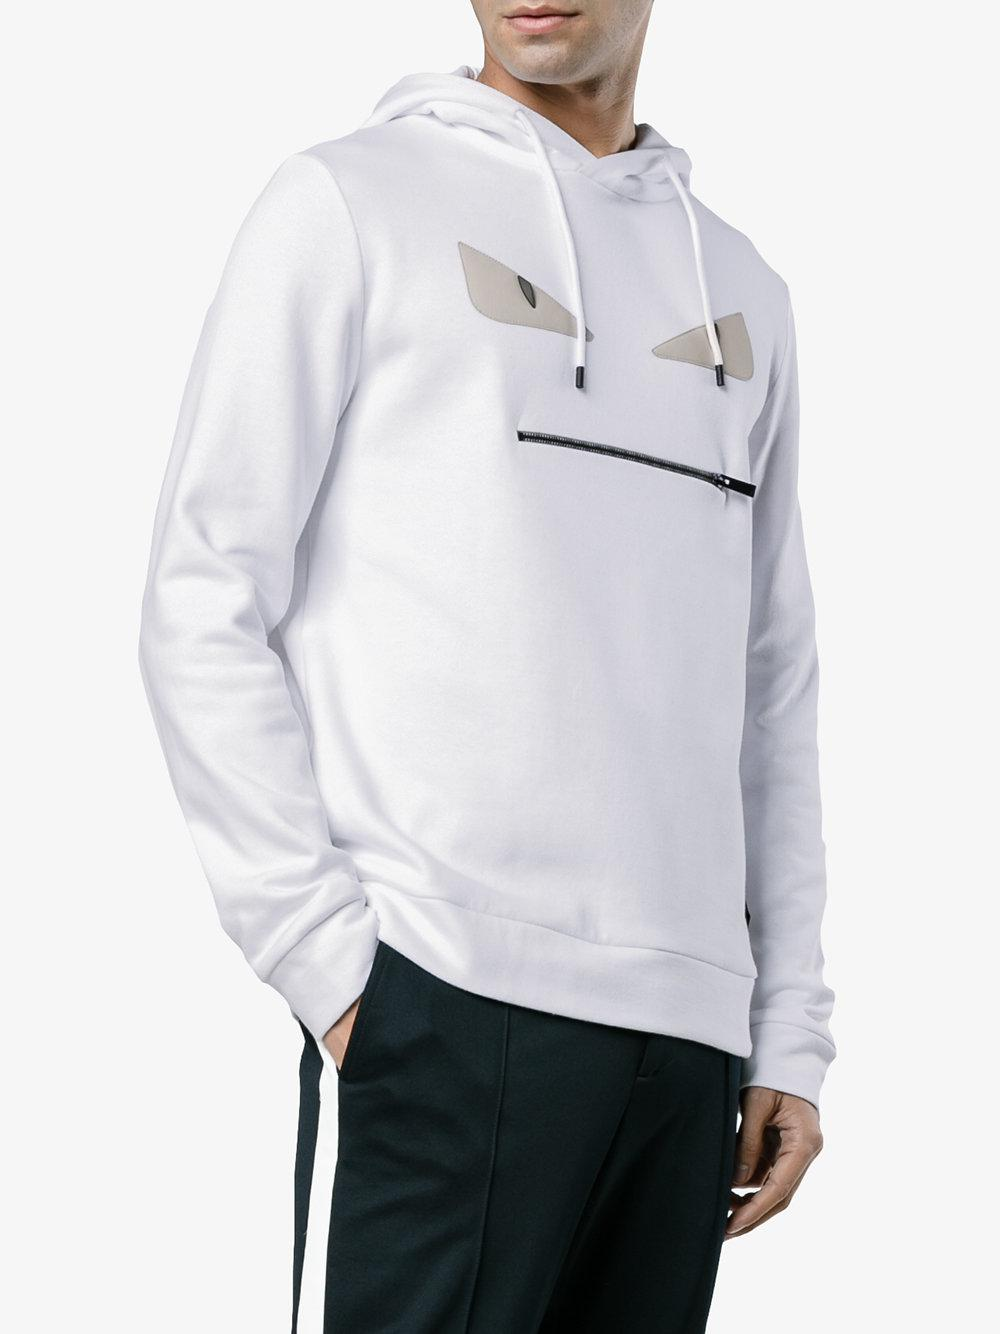 01b6f065cf3 Fendi Sweater Black And White